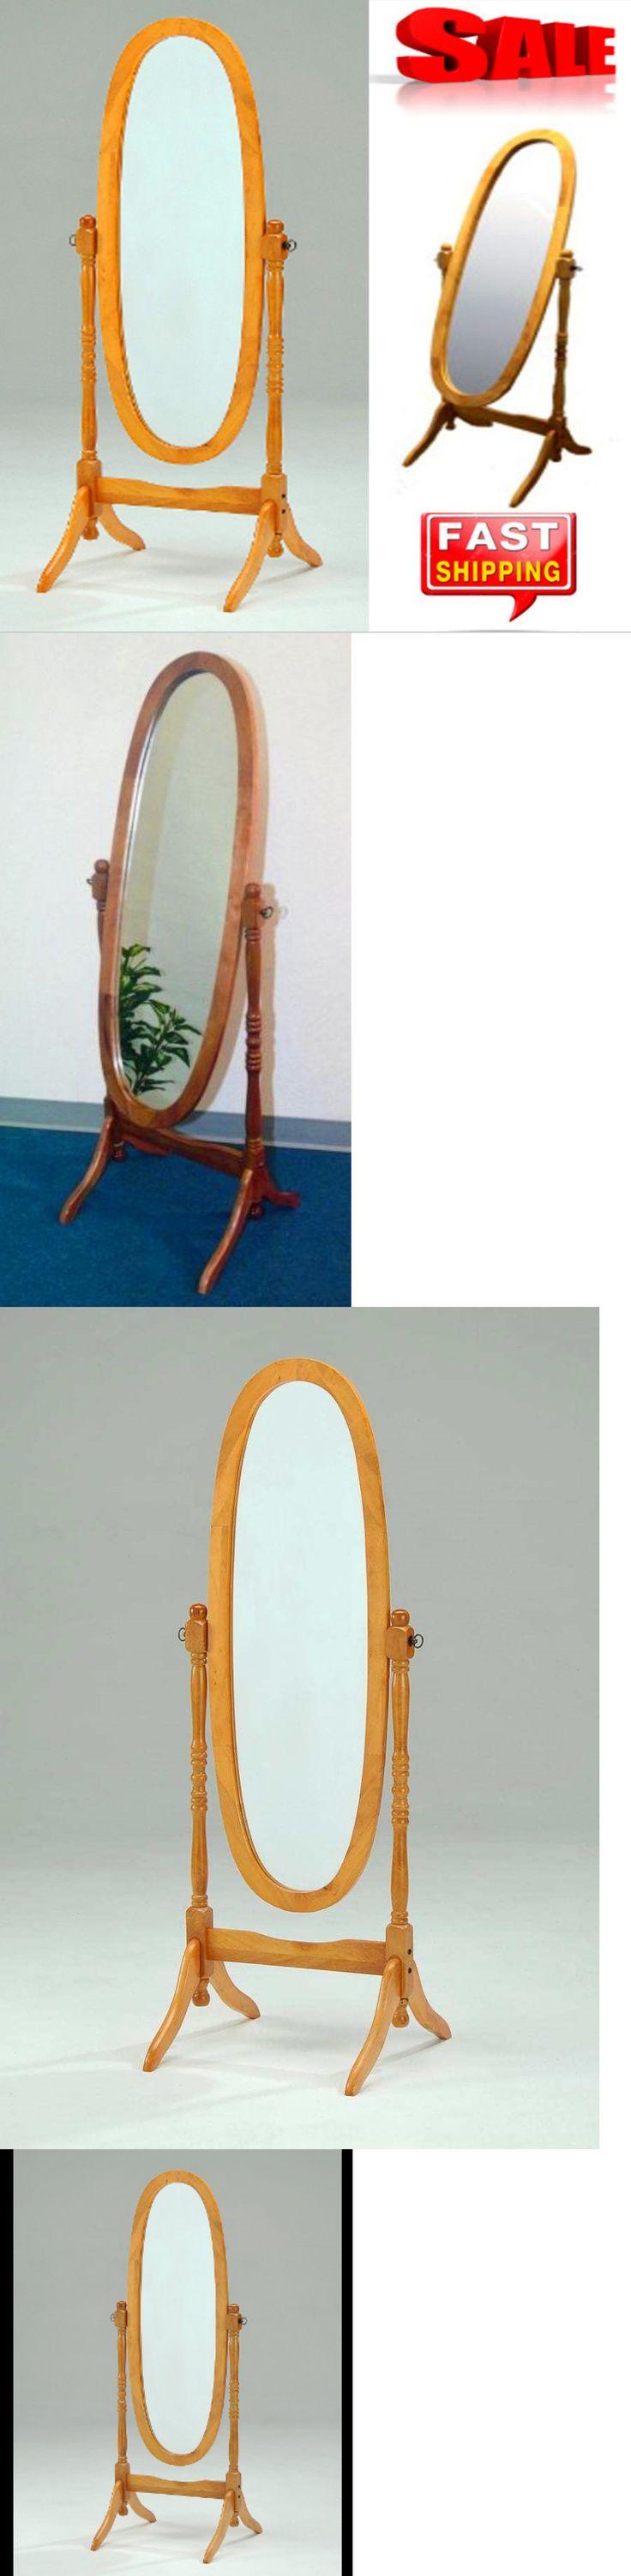 Mirrors 20580: Full Length Oval Floor Standing Mirror Wood Swivel Tilt Cheval Oak Bedroom Stand -> BUY IT NOW ONLY: $56.99 on eBay!